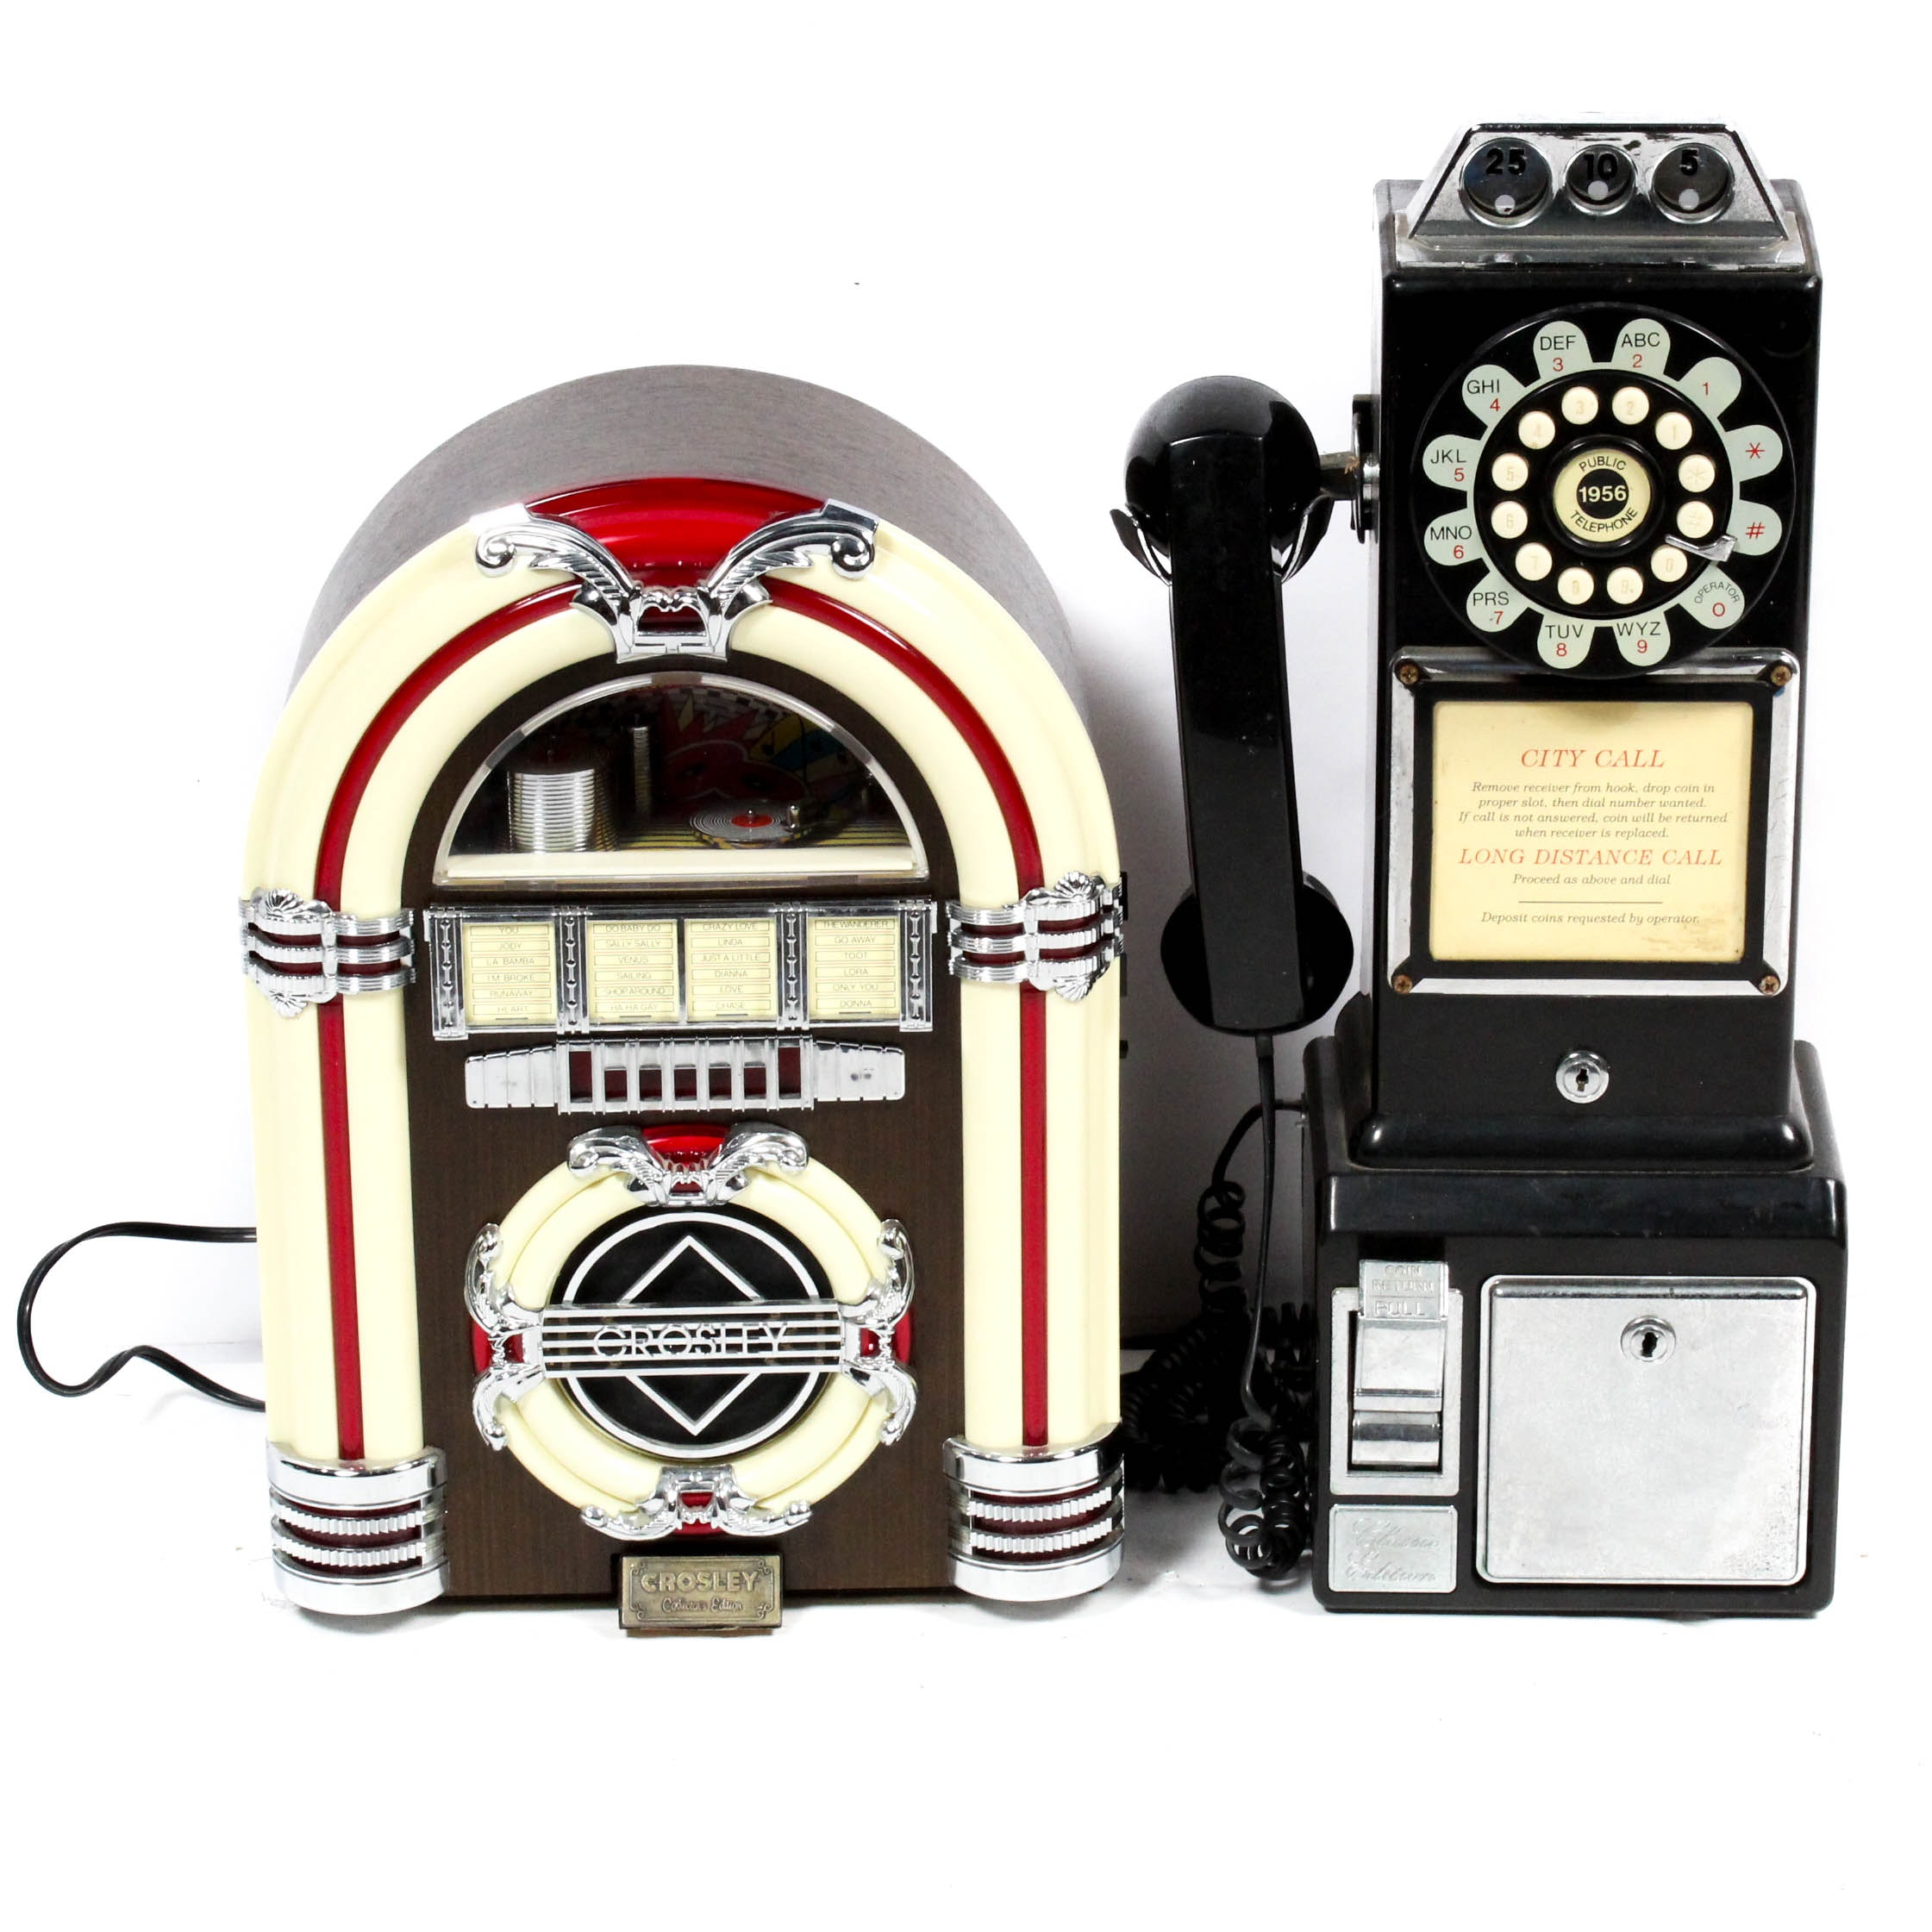 Juke Box Style Tape Deck and Rotary Style Telephone